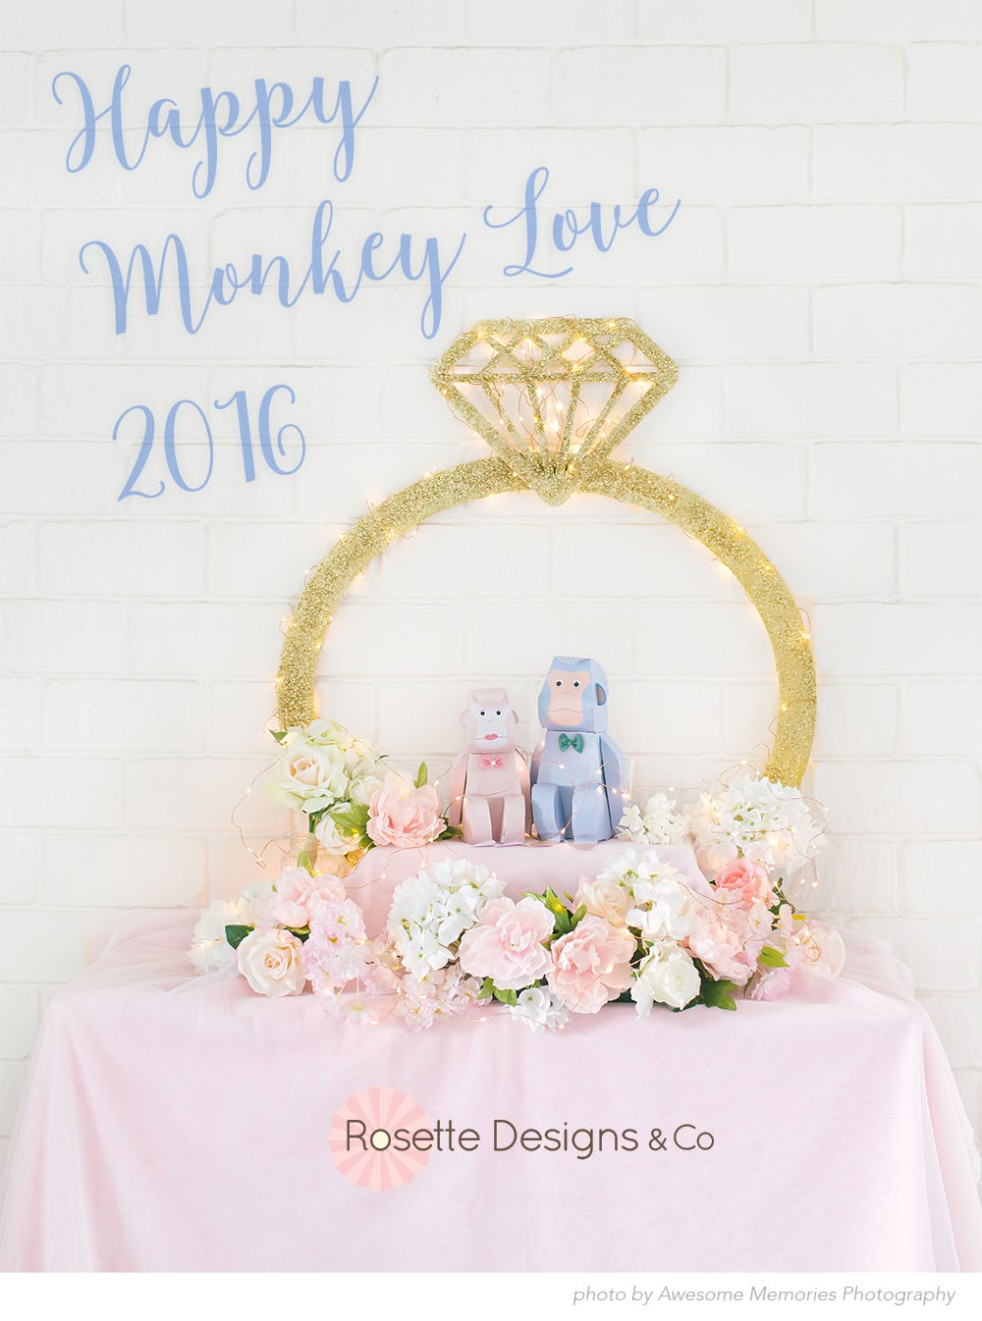 CNY 2016 greeting-smallres